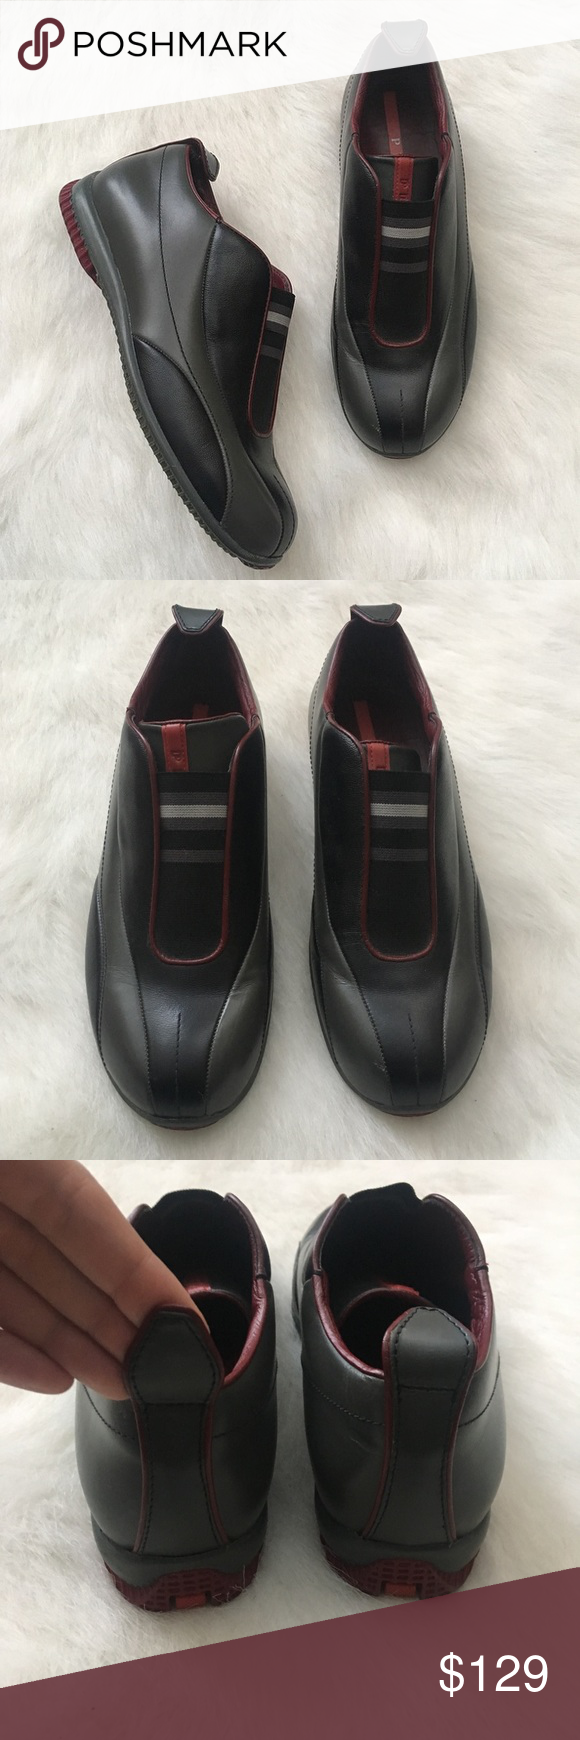 prada no lace shoes Shop Clothing